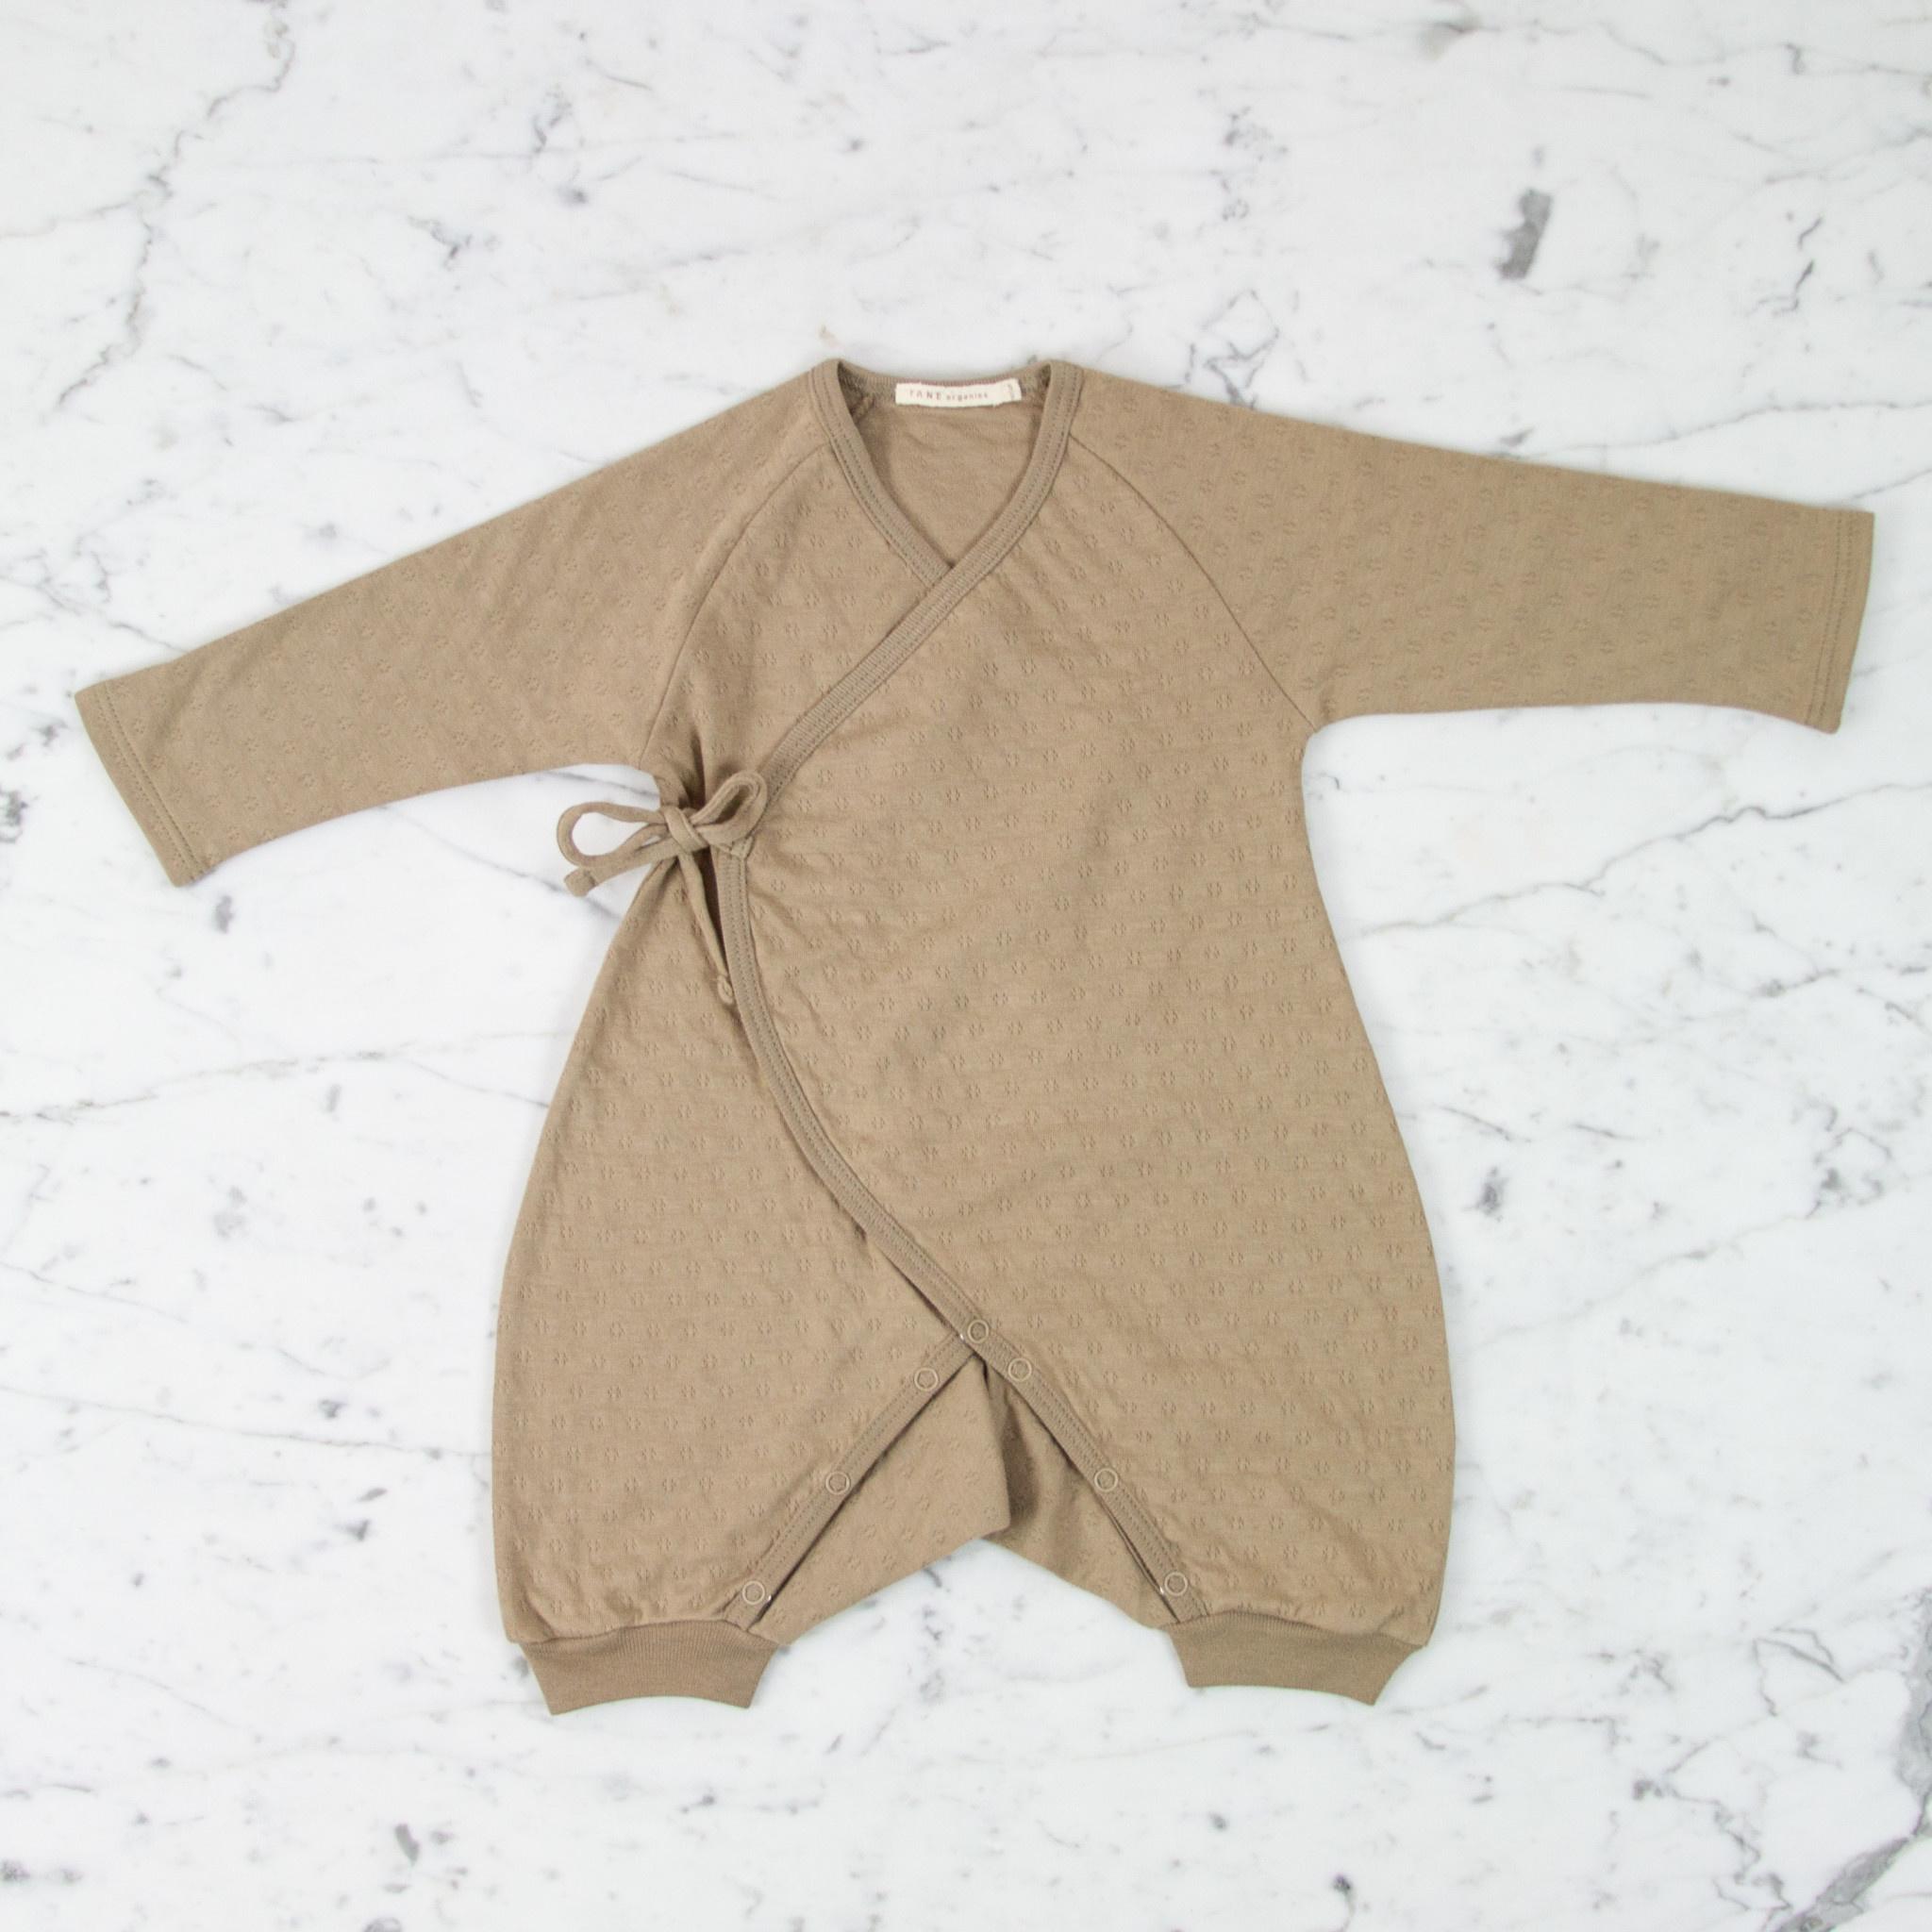 Tane Organics Kimono Onesie with Leggings - Root - 6-9 Month